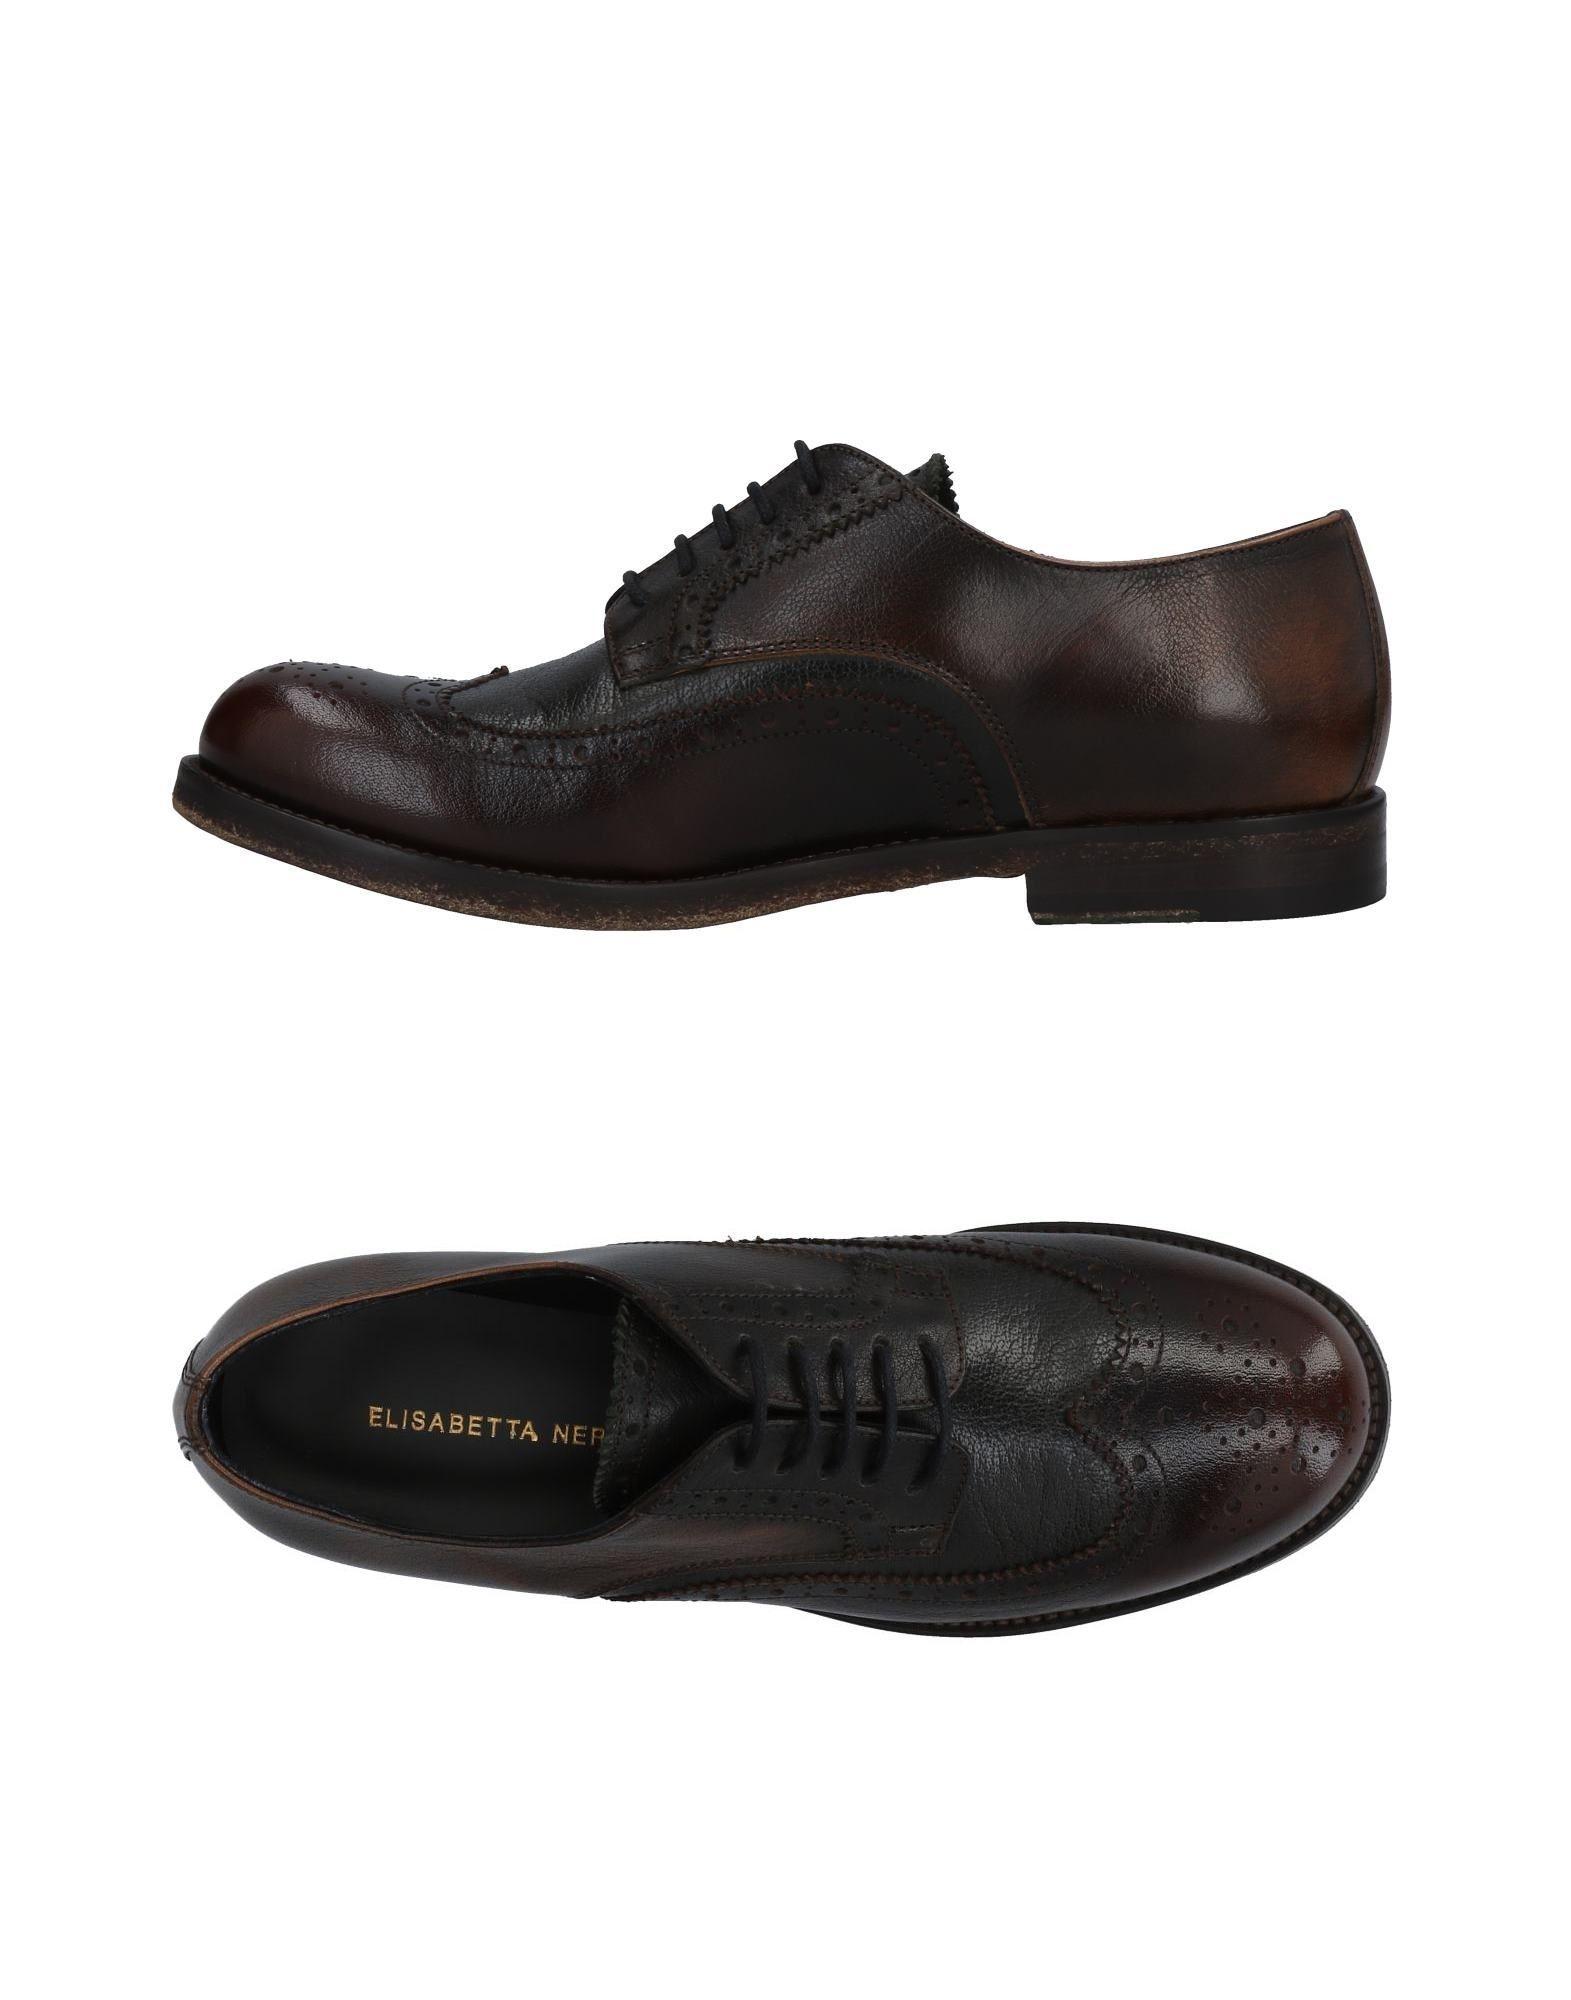 ELISABETTA NERI Обувь на шнурках neri karra 0589 1 20 07